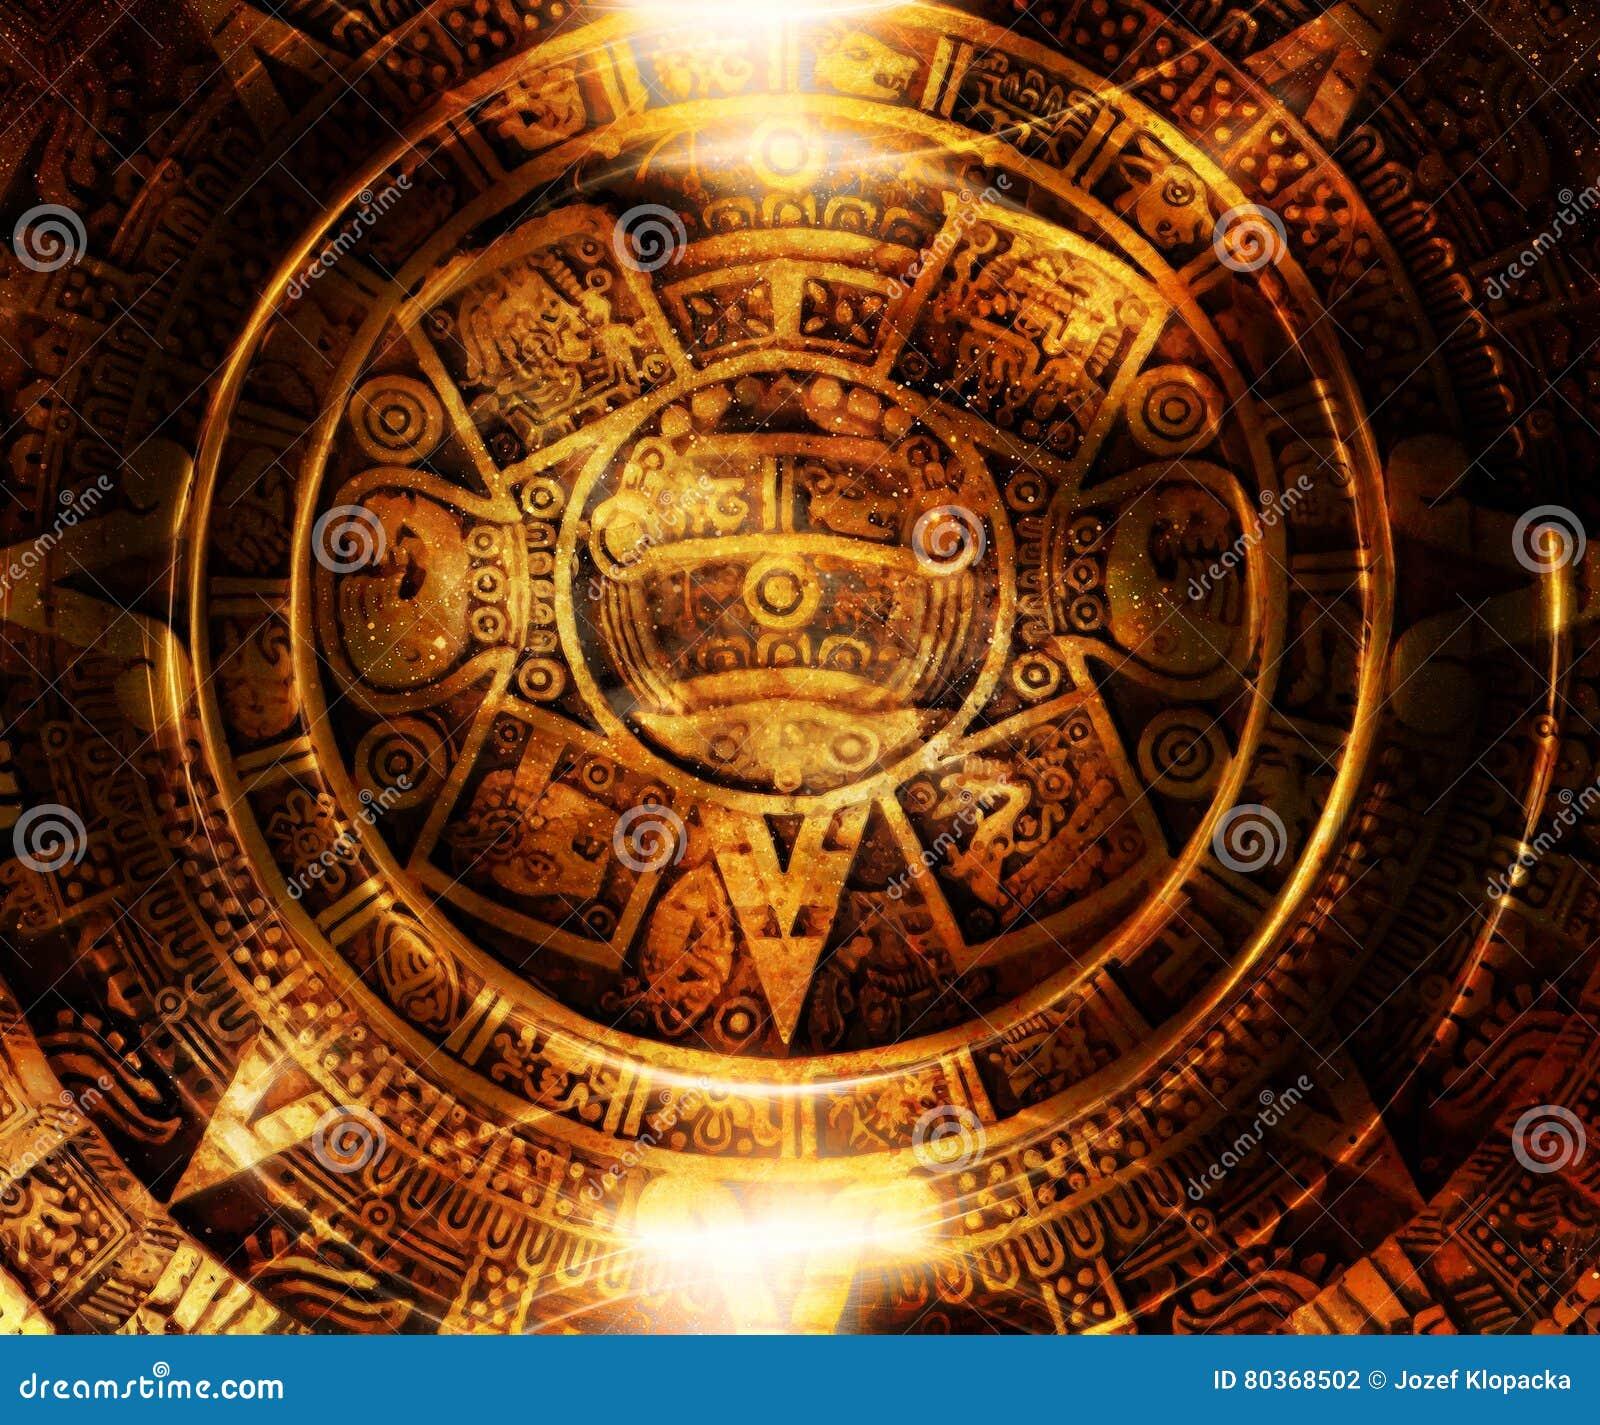 Calendrier Maya Dessin.Calendrier Maya Antique Espace Cosmique Et Etoiles Fond